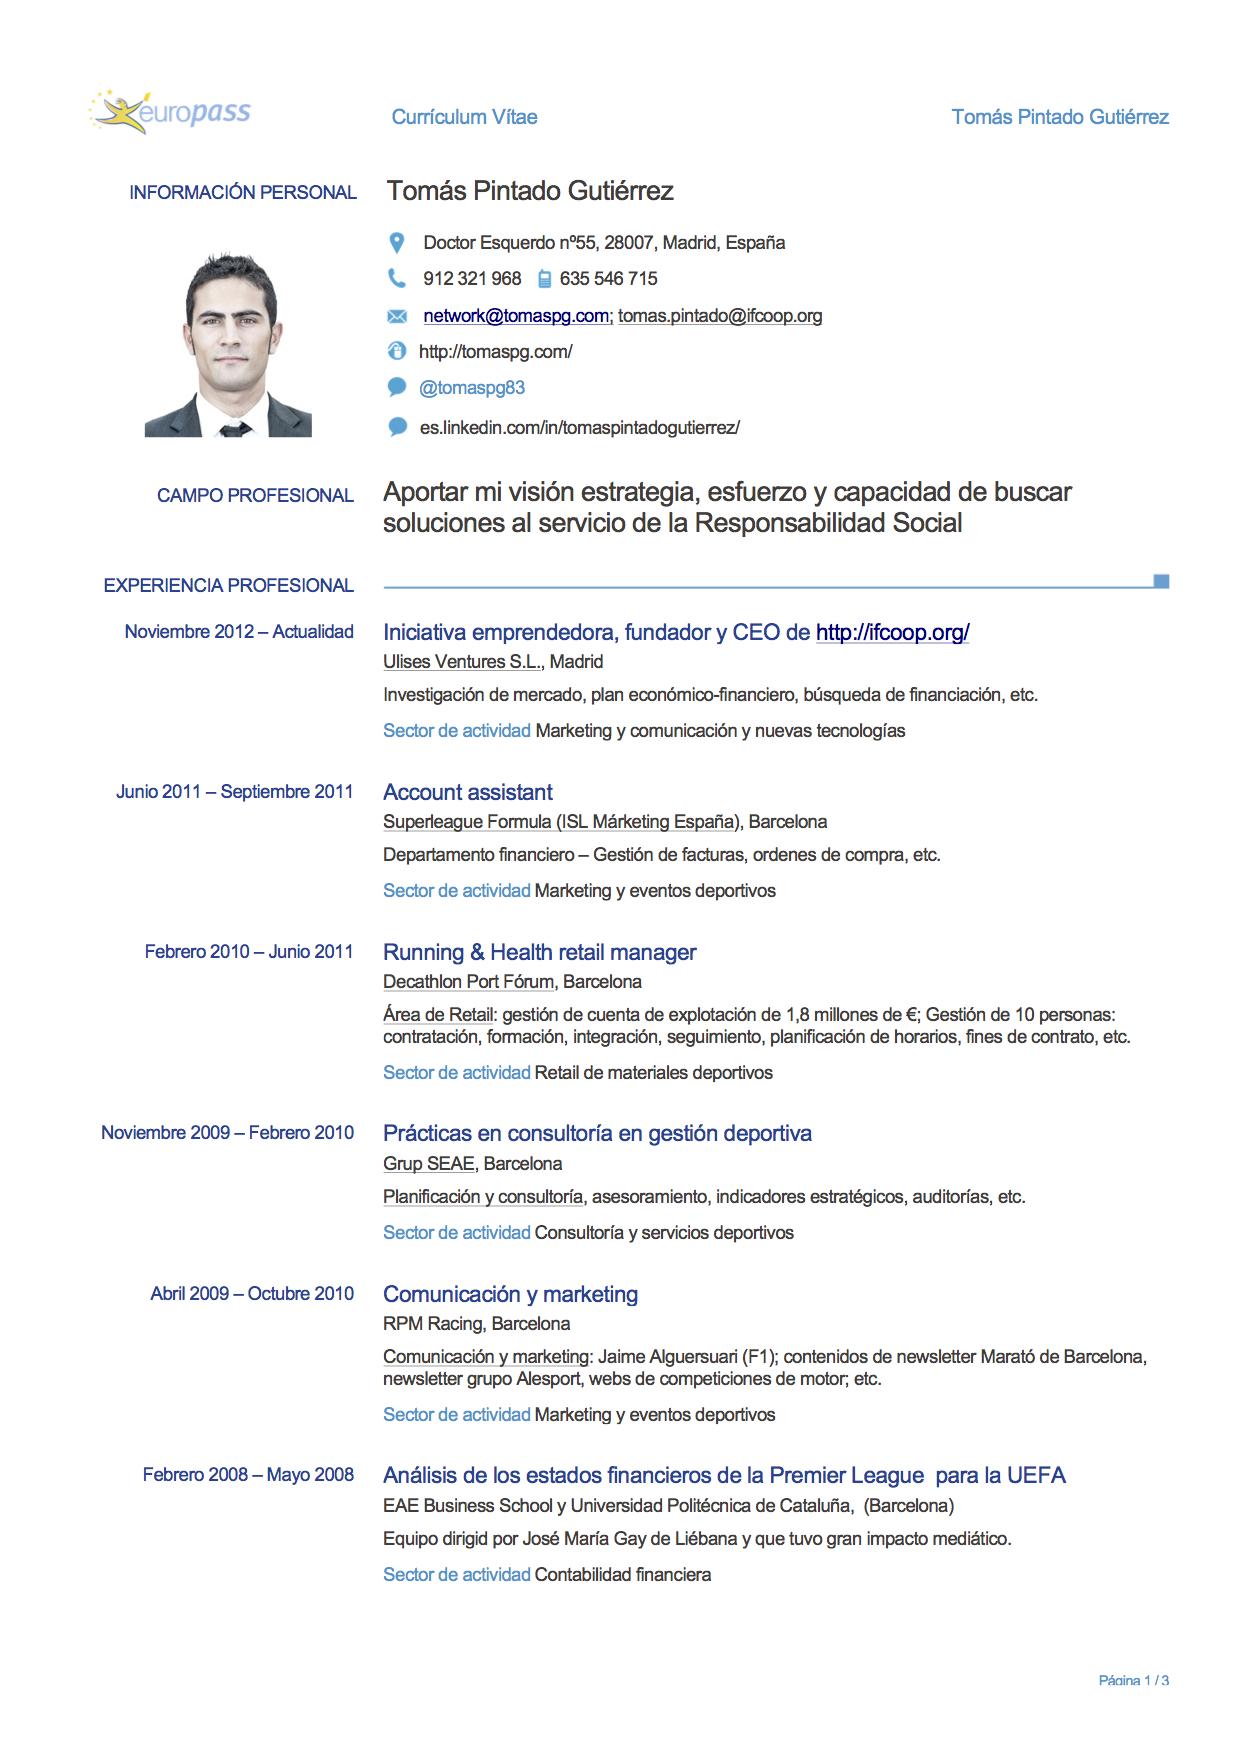 europass curriculum vitae hrvatski      uniimmi com hk